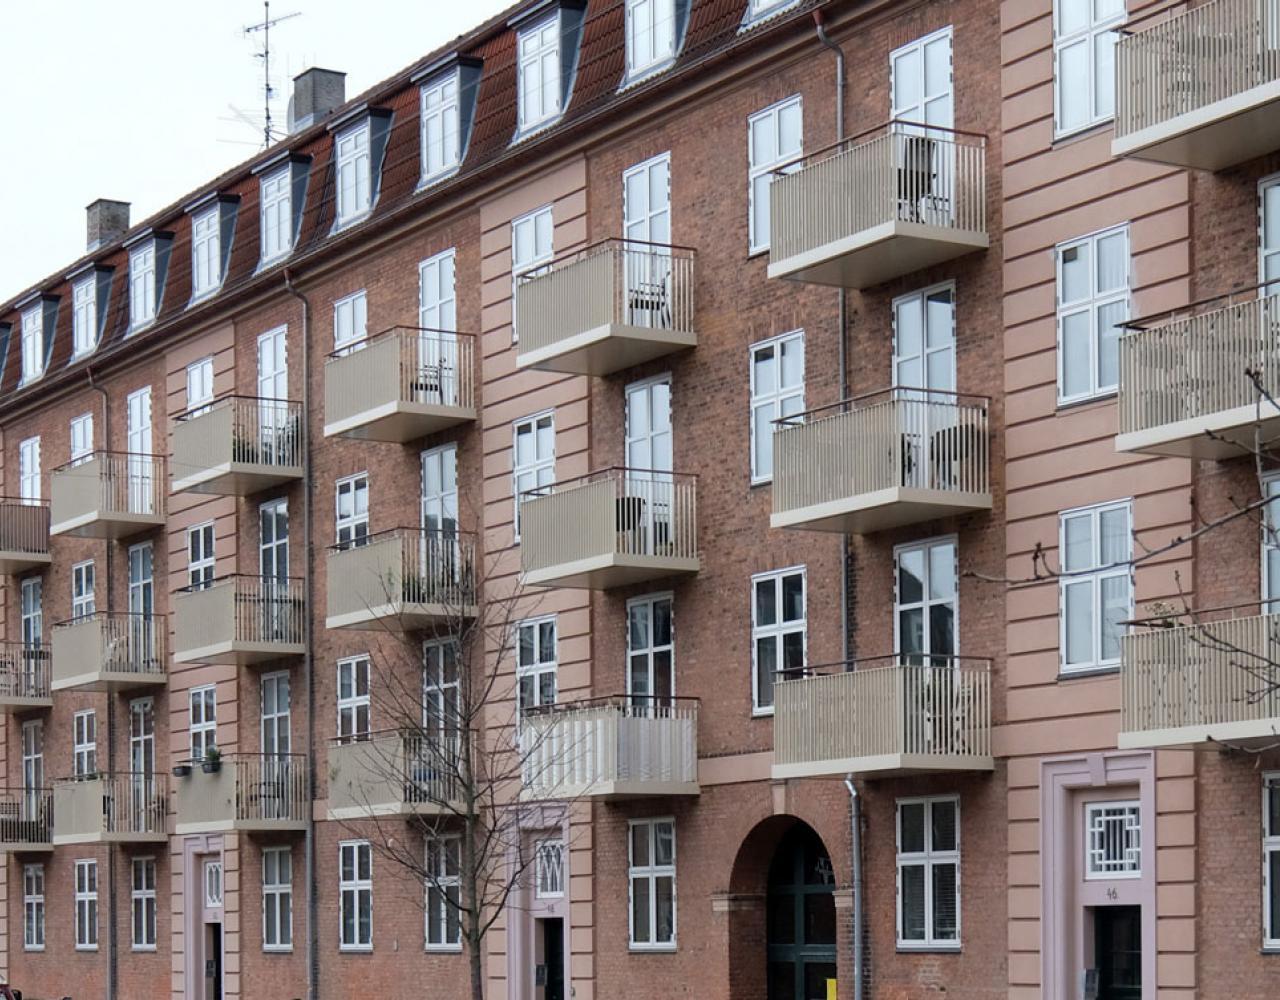 Altaner Tåsingegade